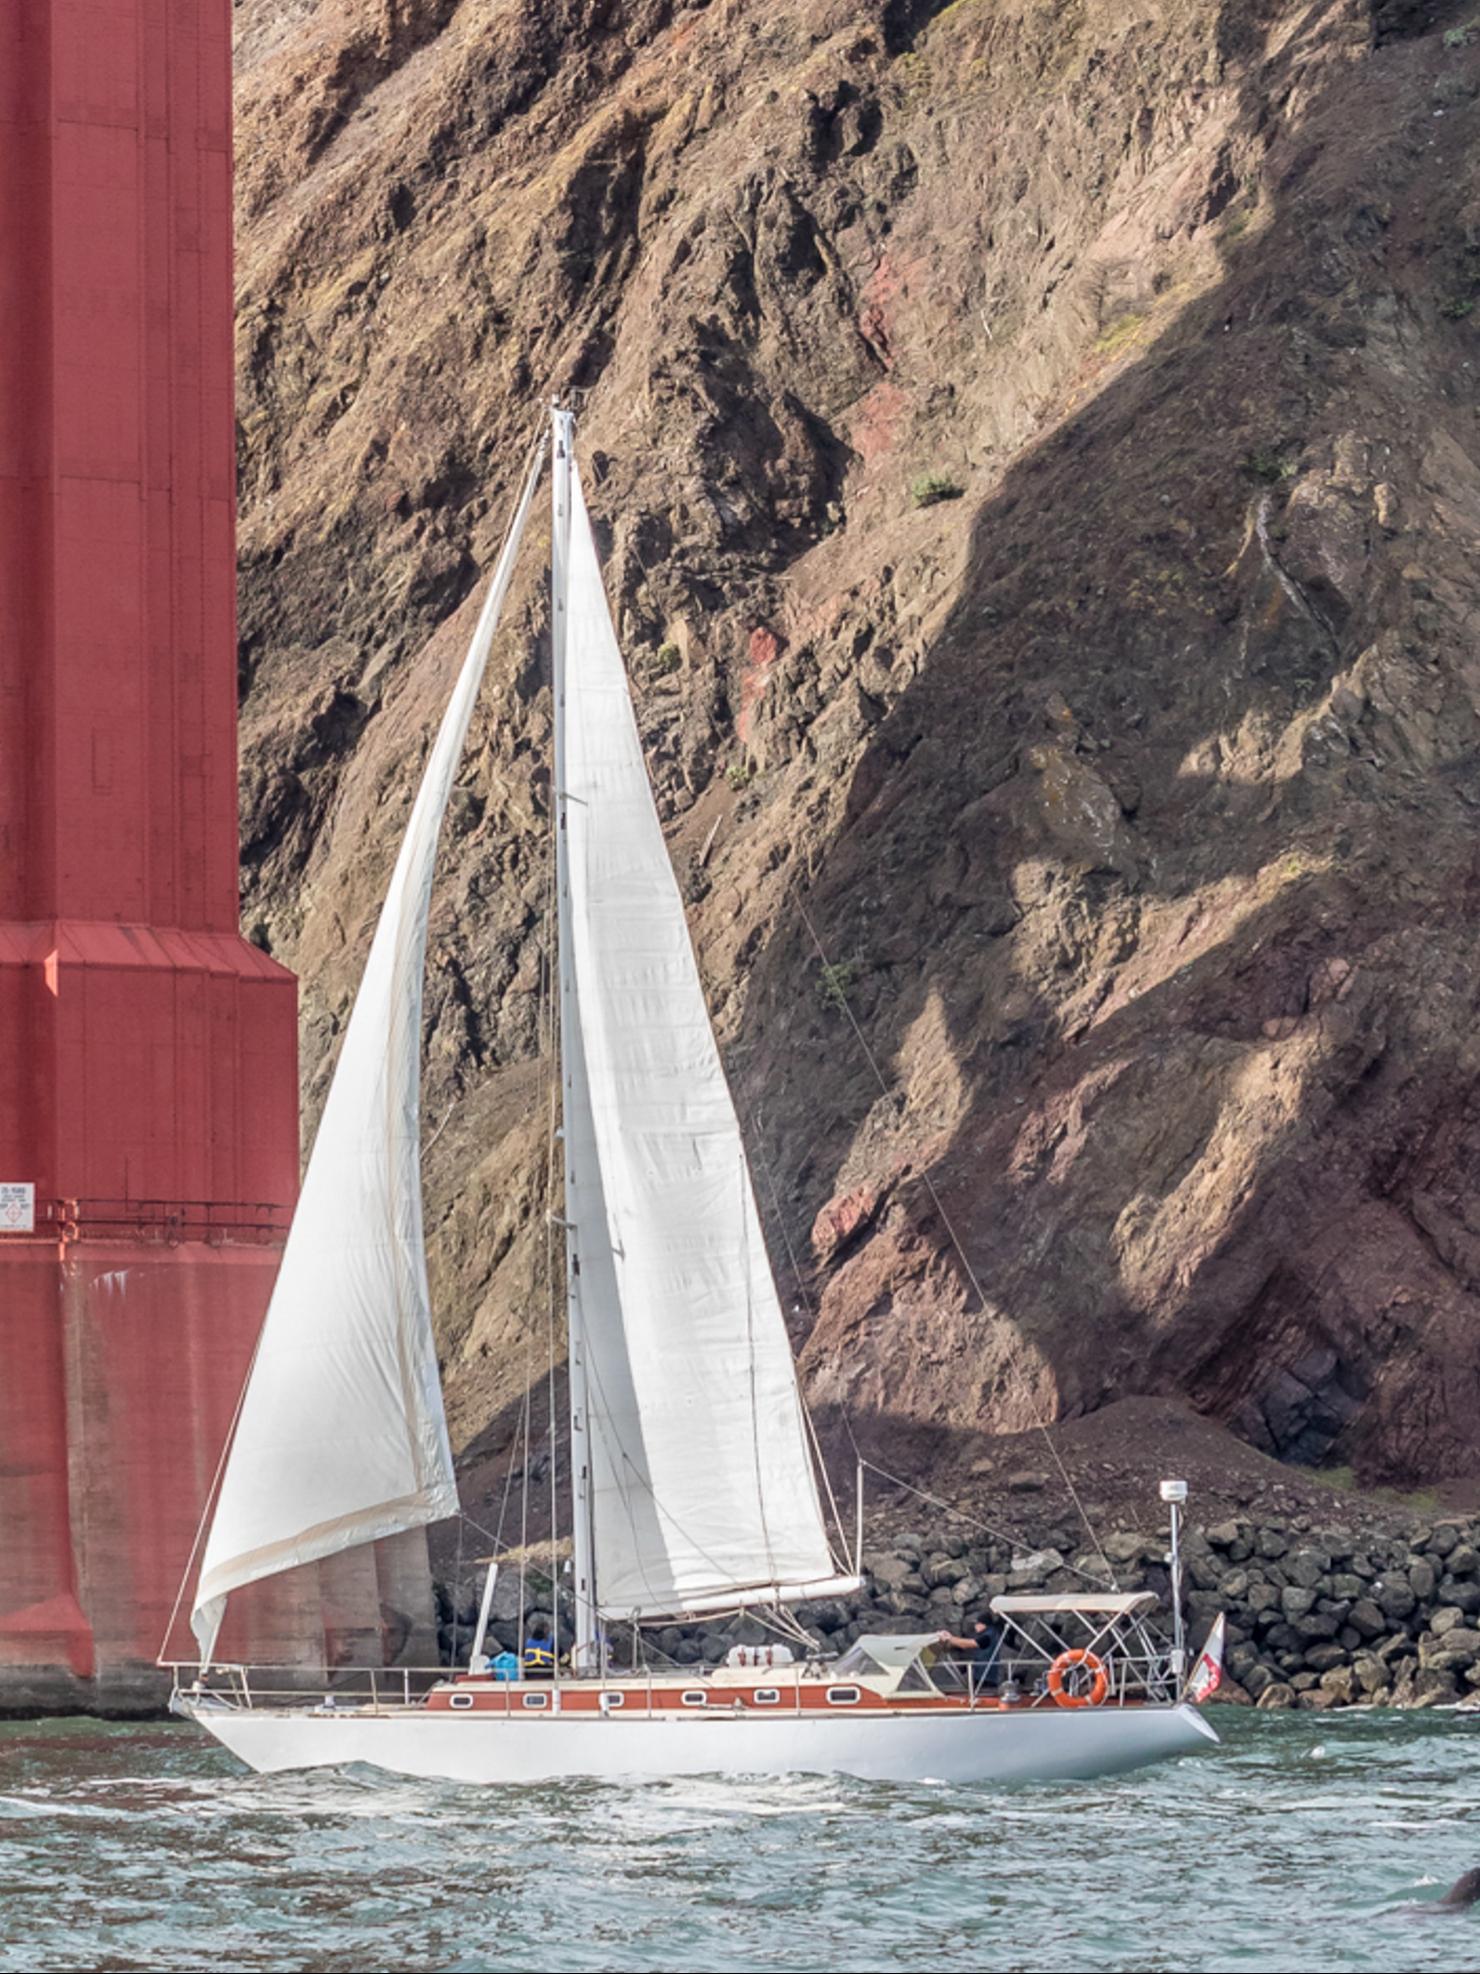 Alsager under the Golden Gate!